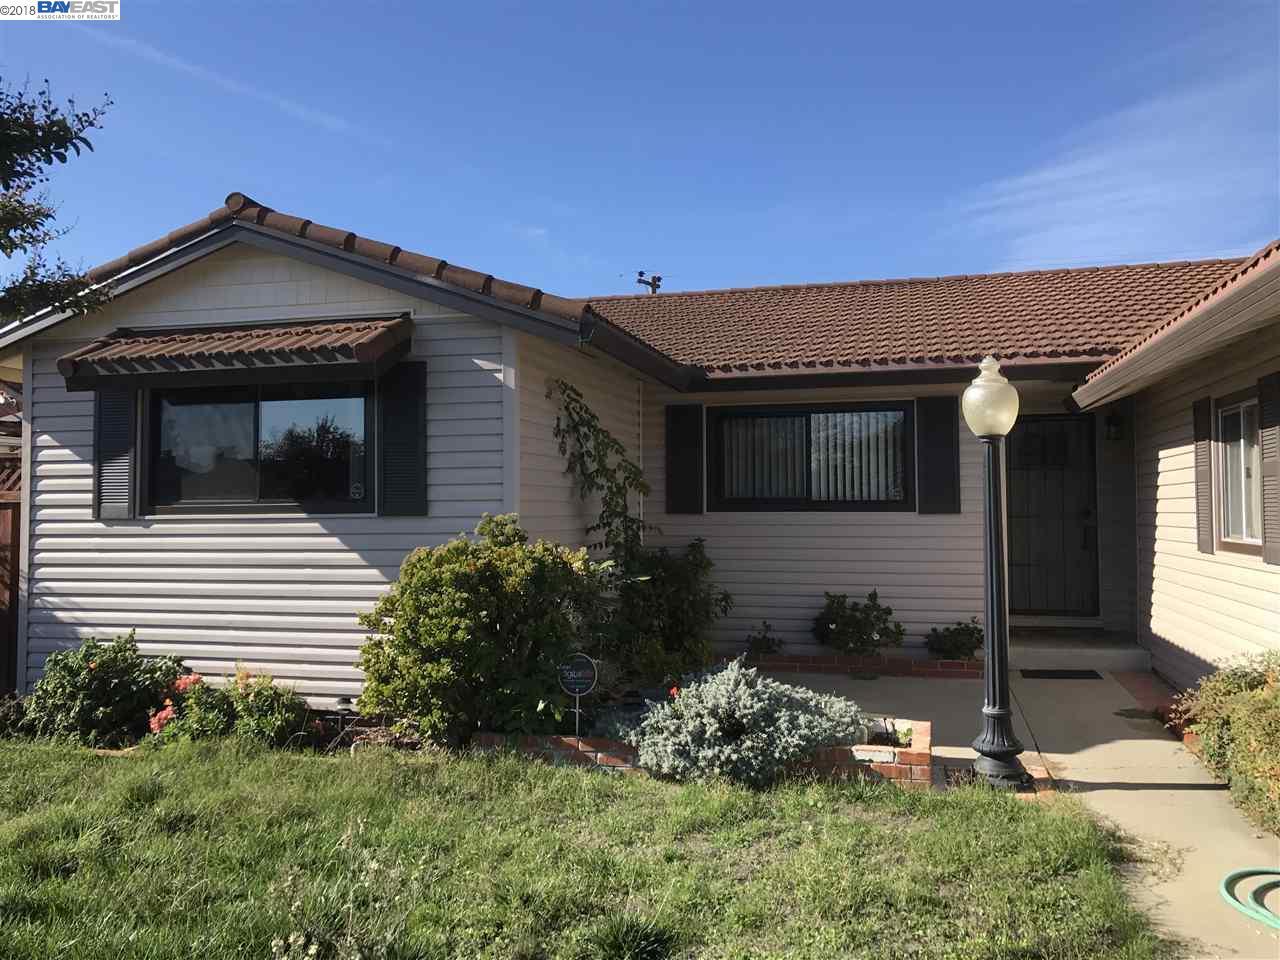 Casa Unifamiliar por un Alquiler en 4279 Blue Ridge Street 4279 Blue Ridge Street Fremont, California 94536 Estados Unidos